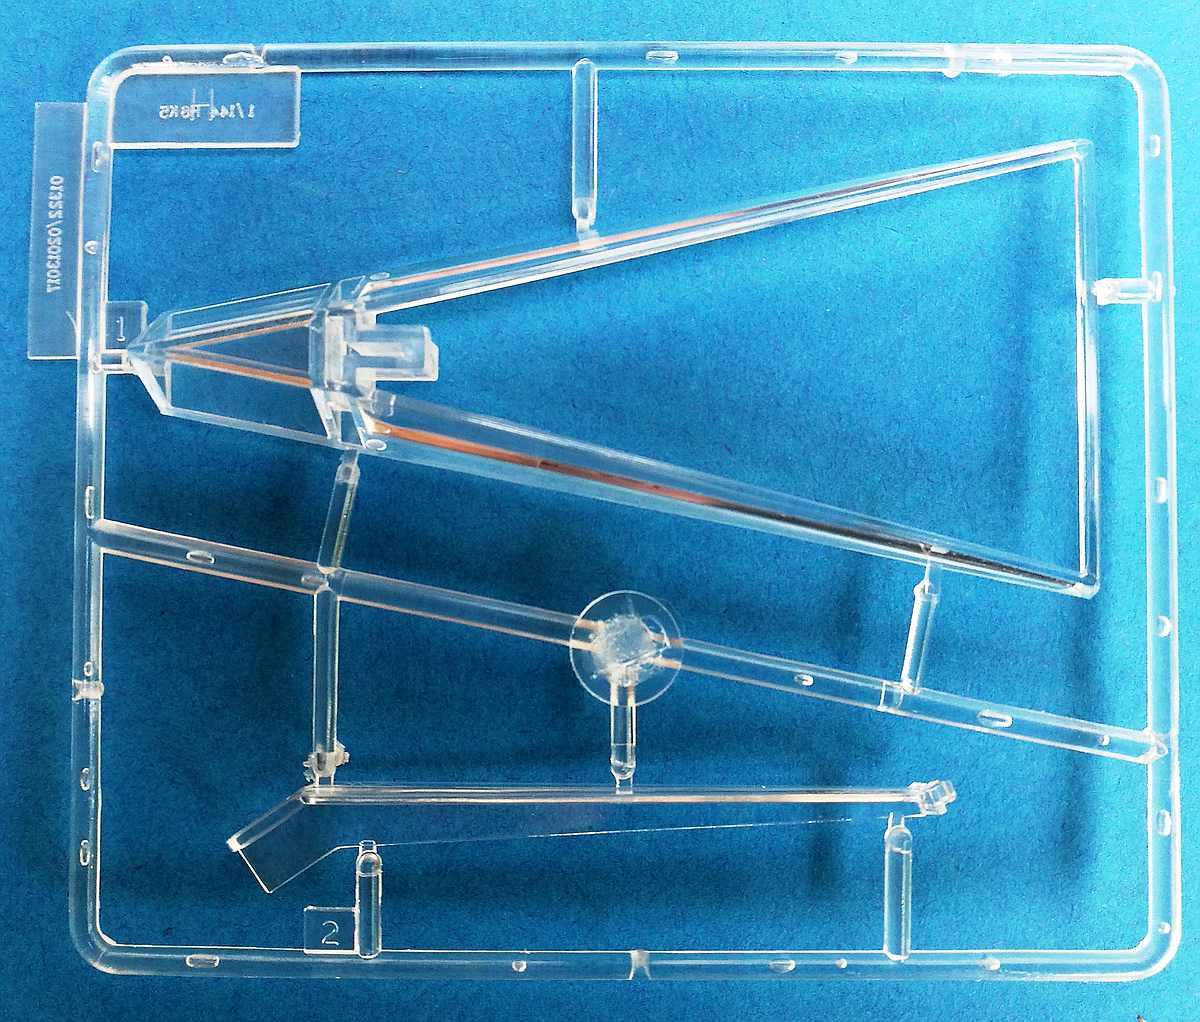 Trumpeter-01323-Kawanishi-H6K5-L-Mavis-21 Japanisches Flugboot Kawanishi H6K5-L im Maßstab 1:144 von Trumpeter